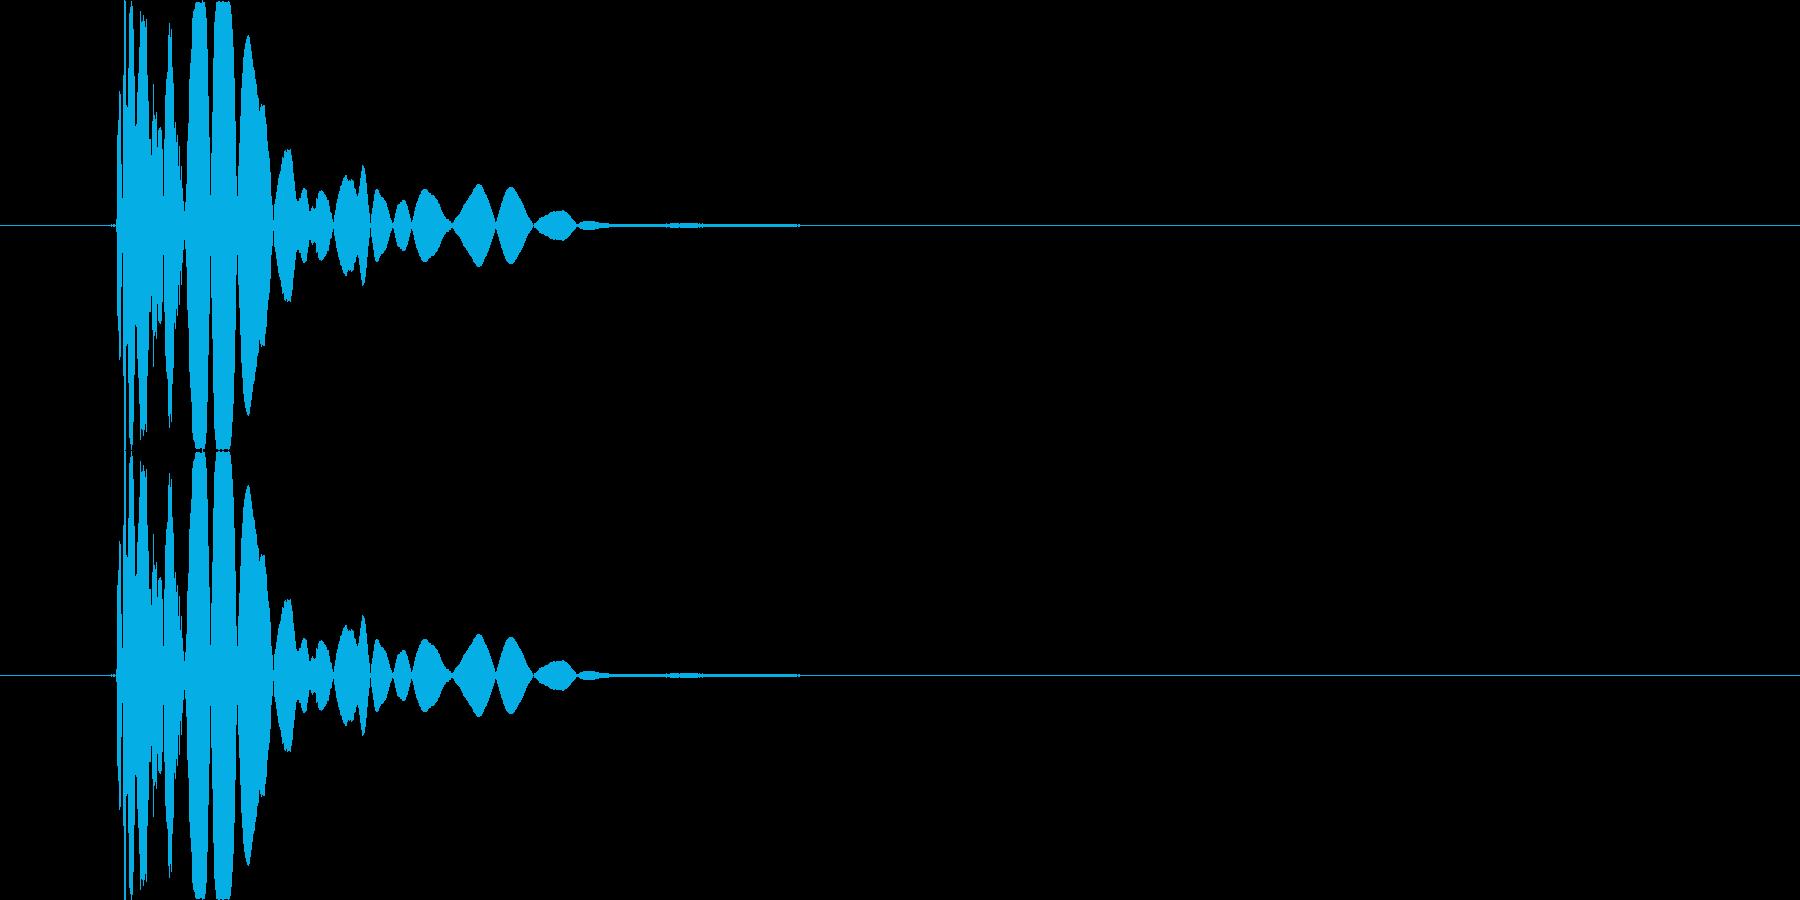 【SE】打撃音(パンチ03)の再生済みの波形